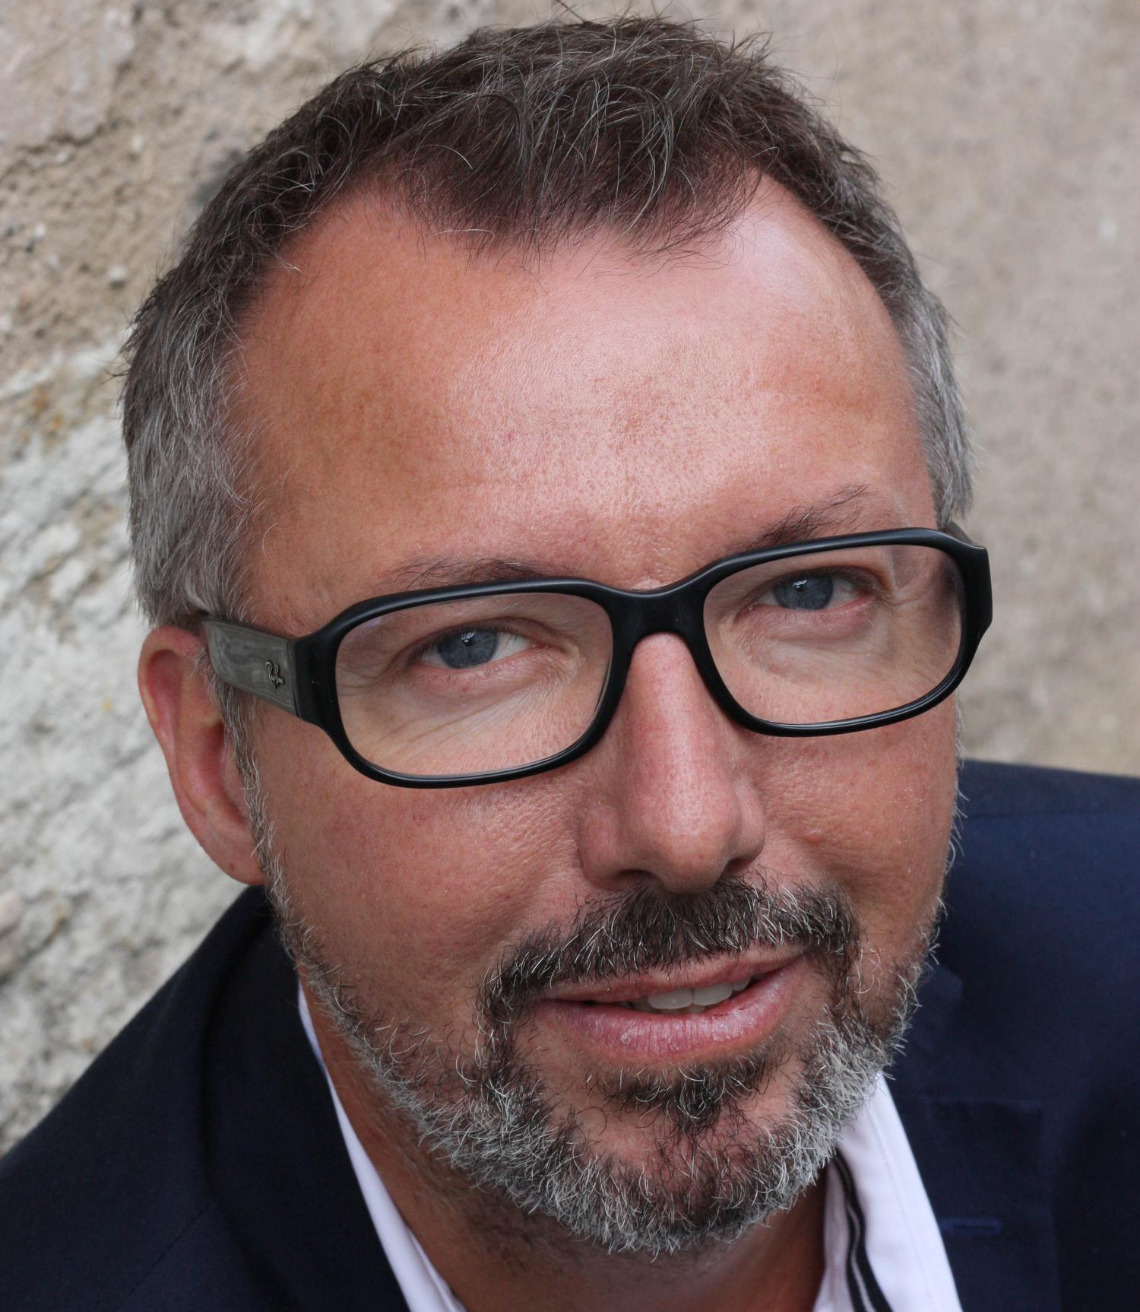 Jean-Christophe HOUIN